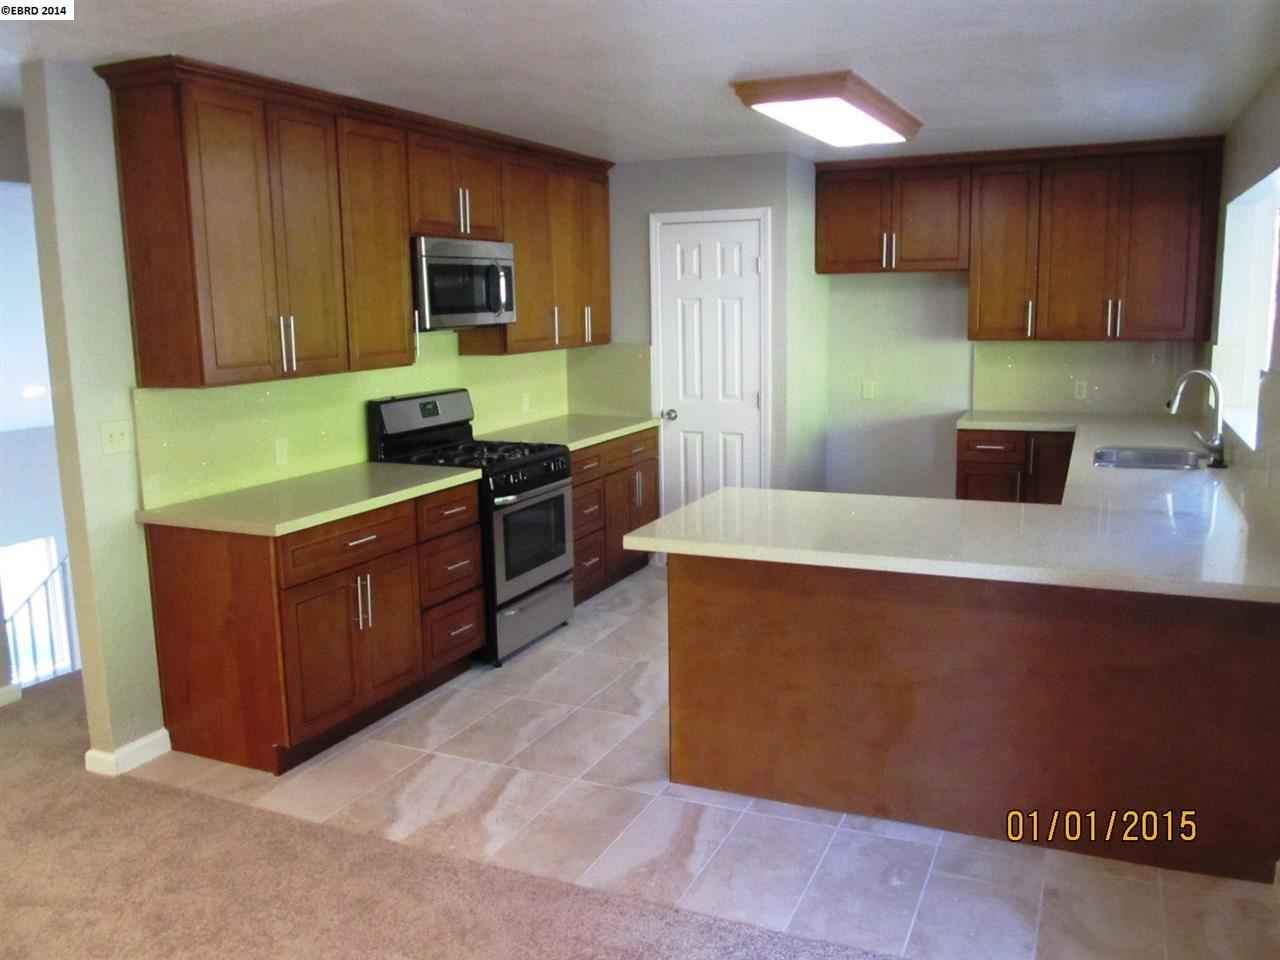 Additional photo for property listing at 3016 ELMO Road  Antioch, California 94509 Estados Unidos